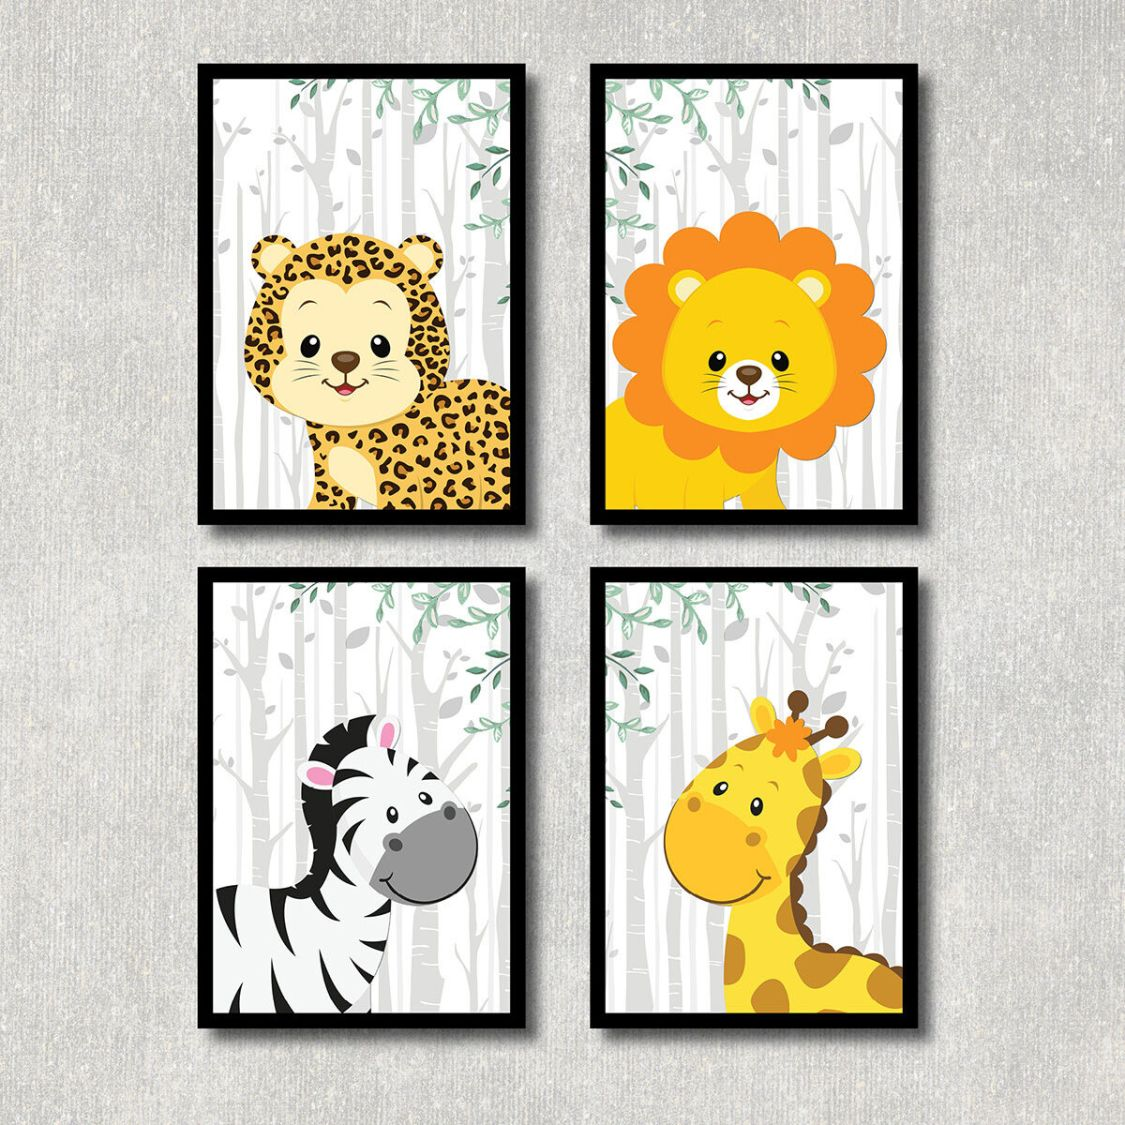 Bild Dschungel Tiere Kunstdruck A4 Afrika Safari Poster Kinderzimmer Deko